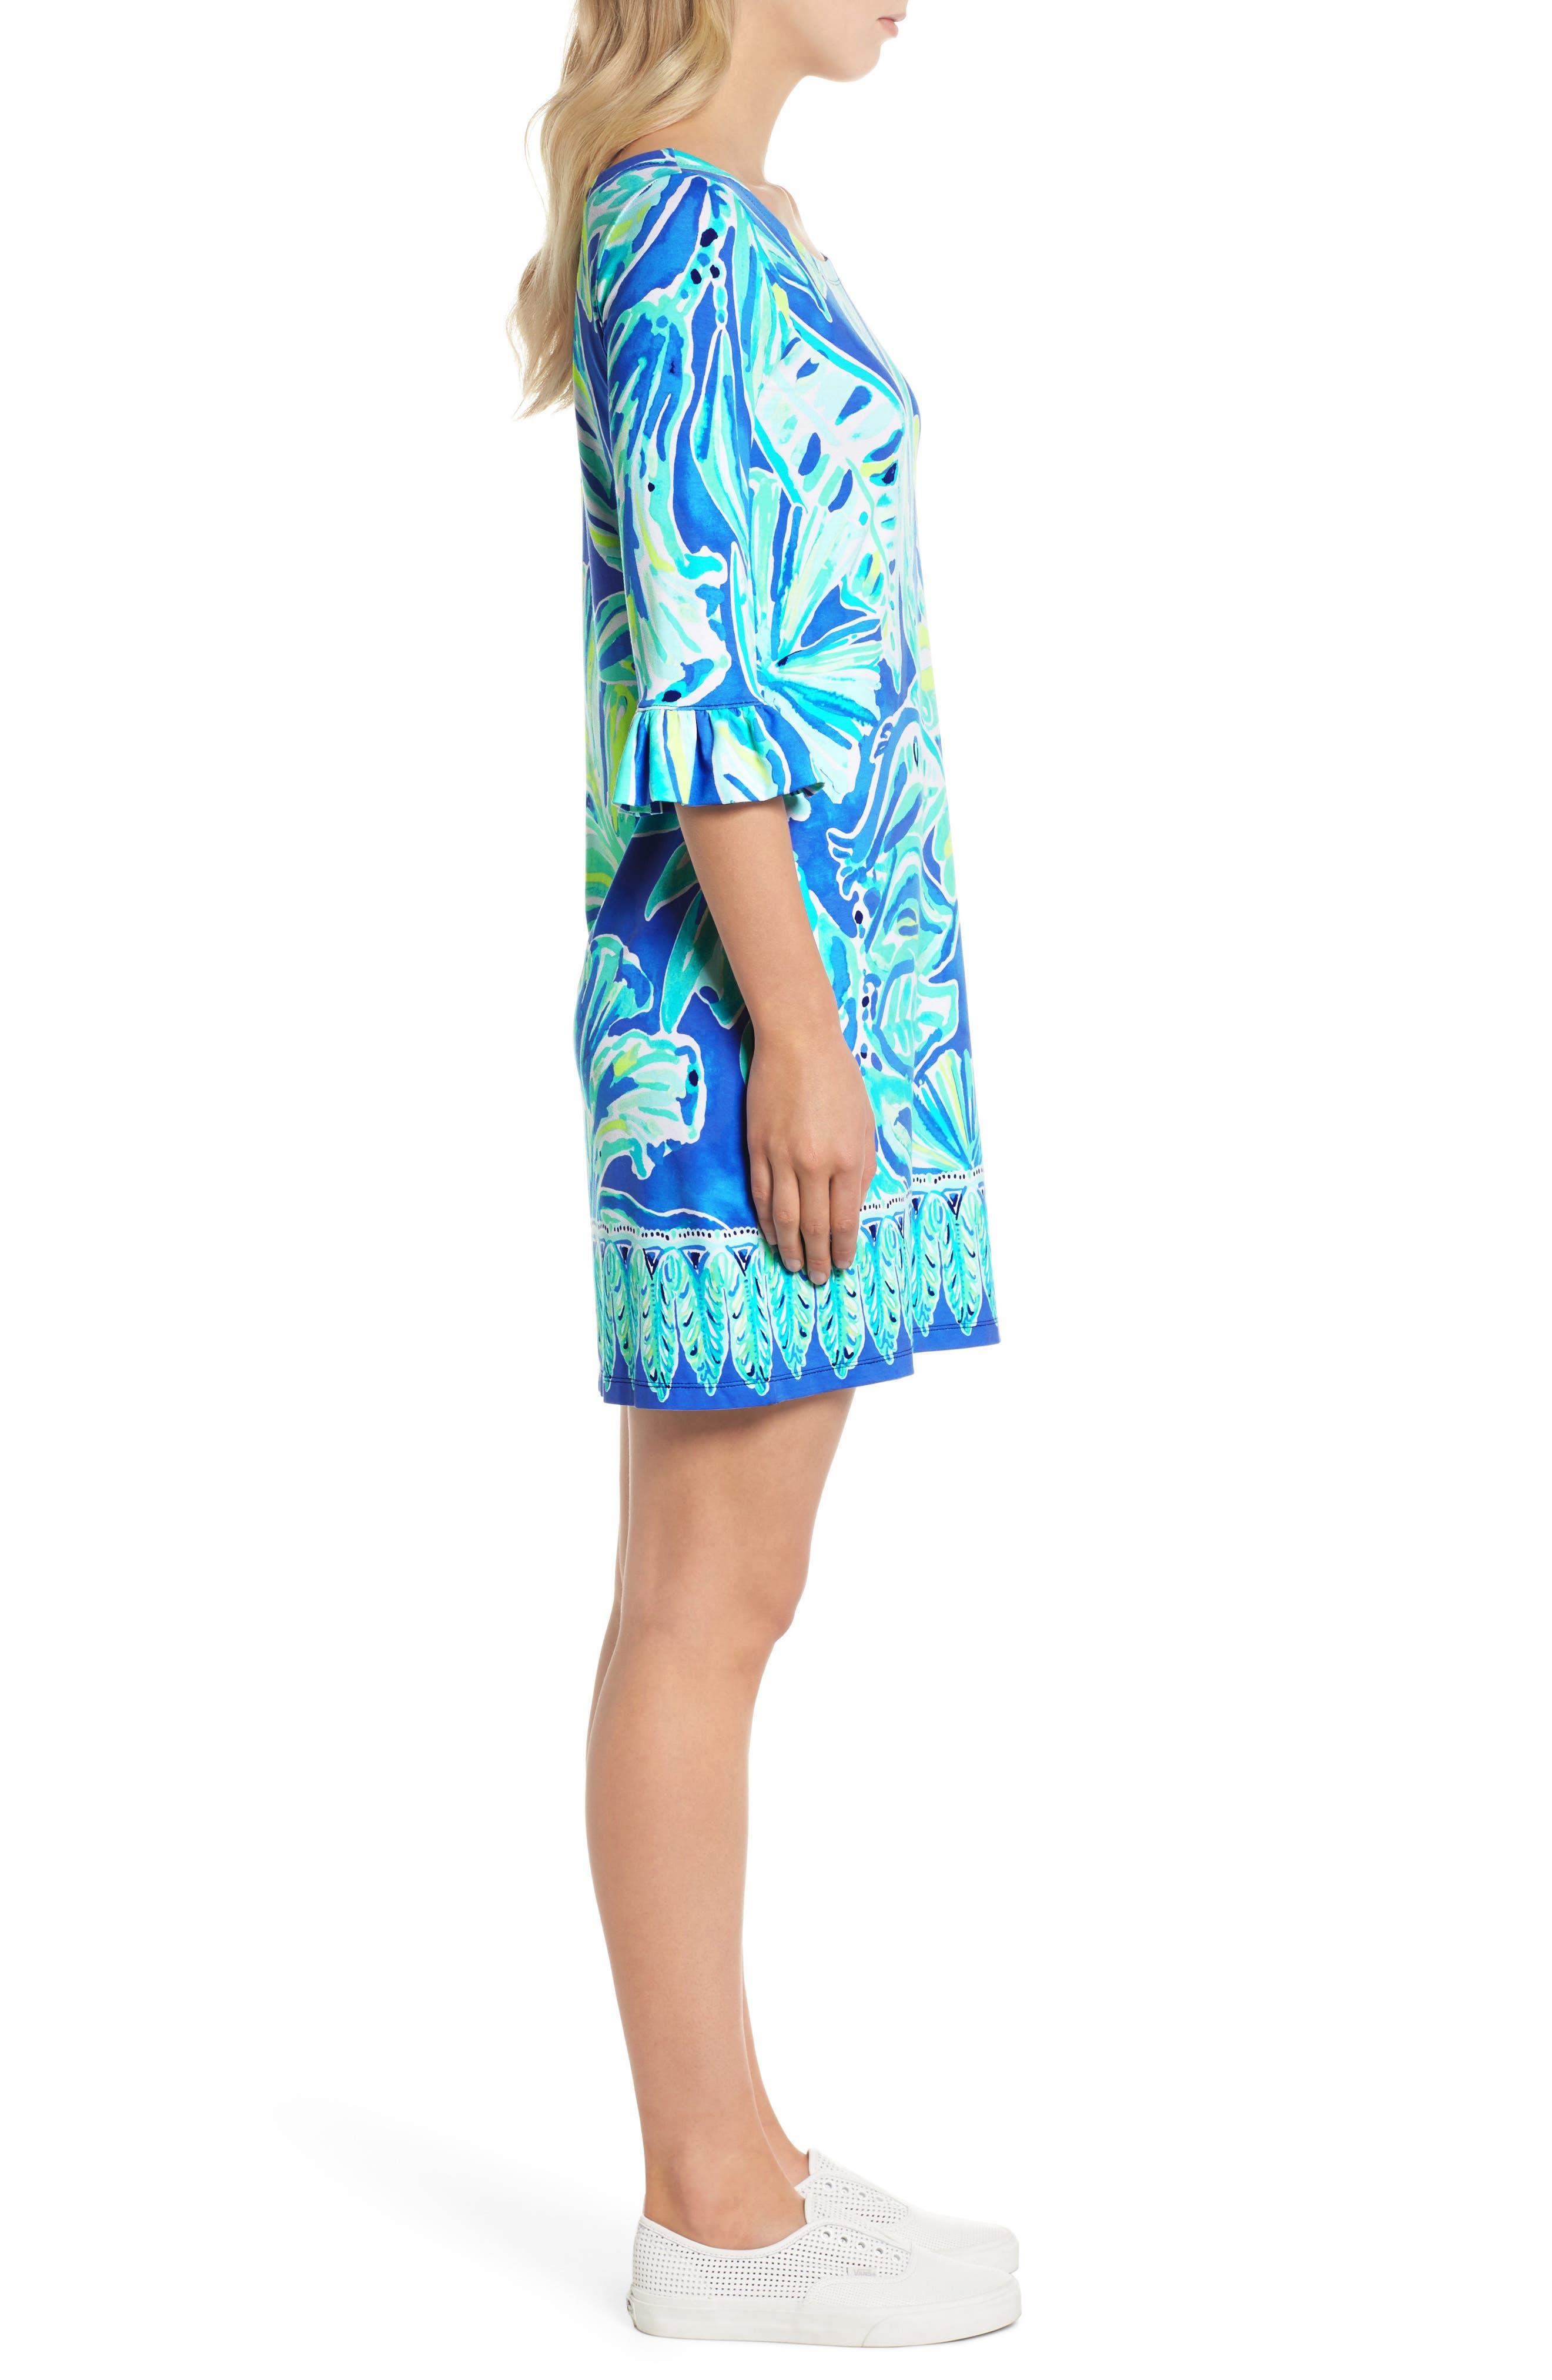 Sophie UPF 50+ Shift Dress,                             Alternate thumbnail 3, color,                             Beckon Blue Palm Passage